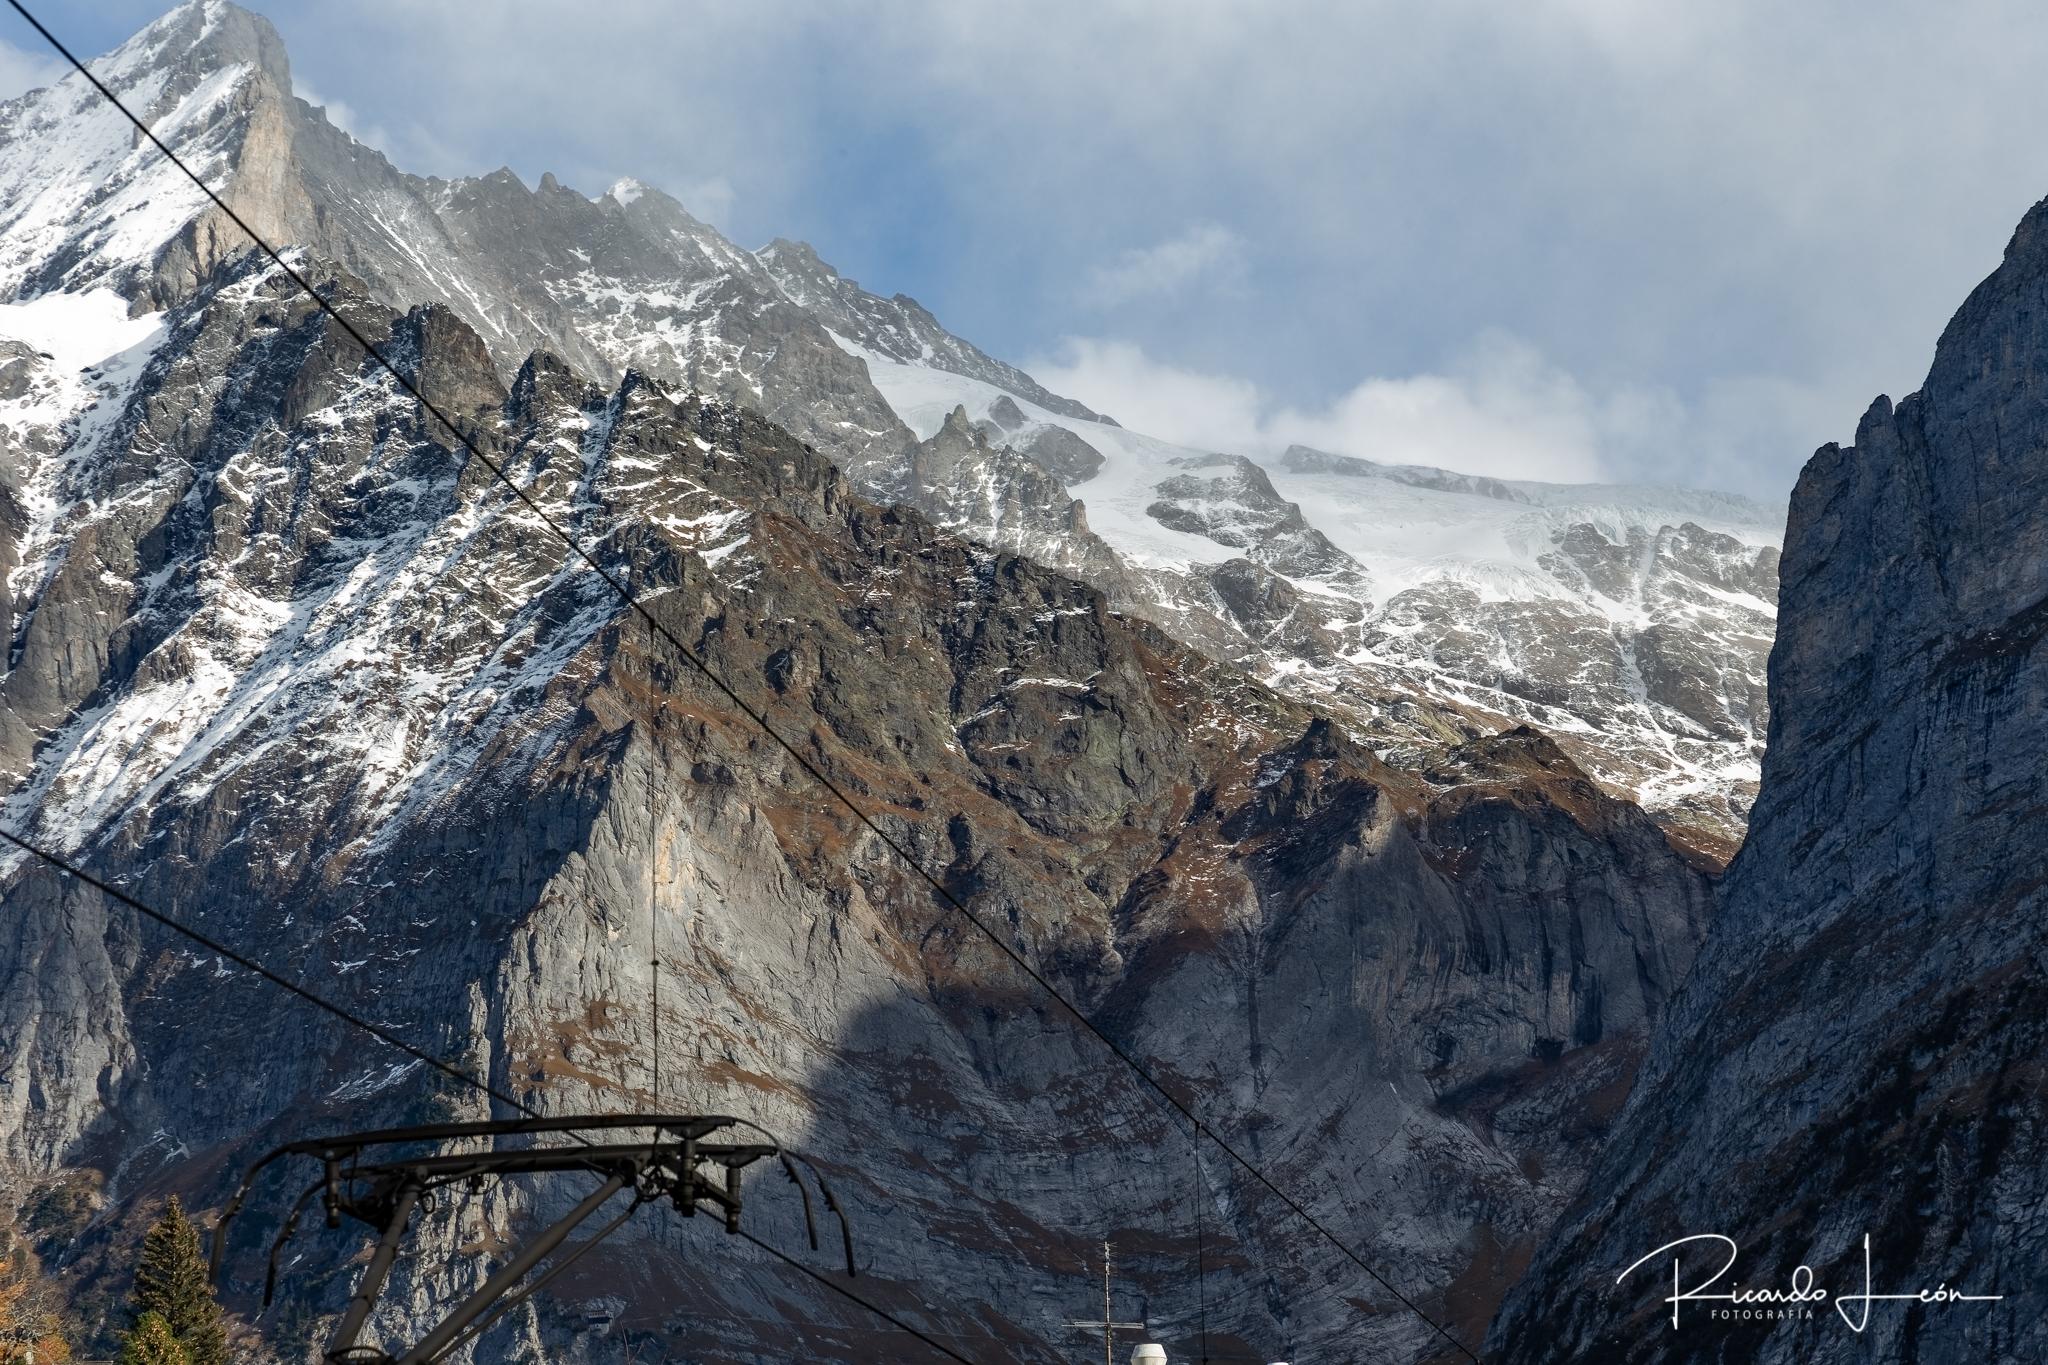 WIX_Viaje a Jungfraujoch_MG_5999